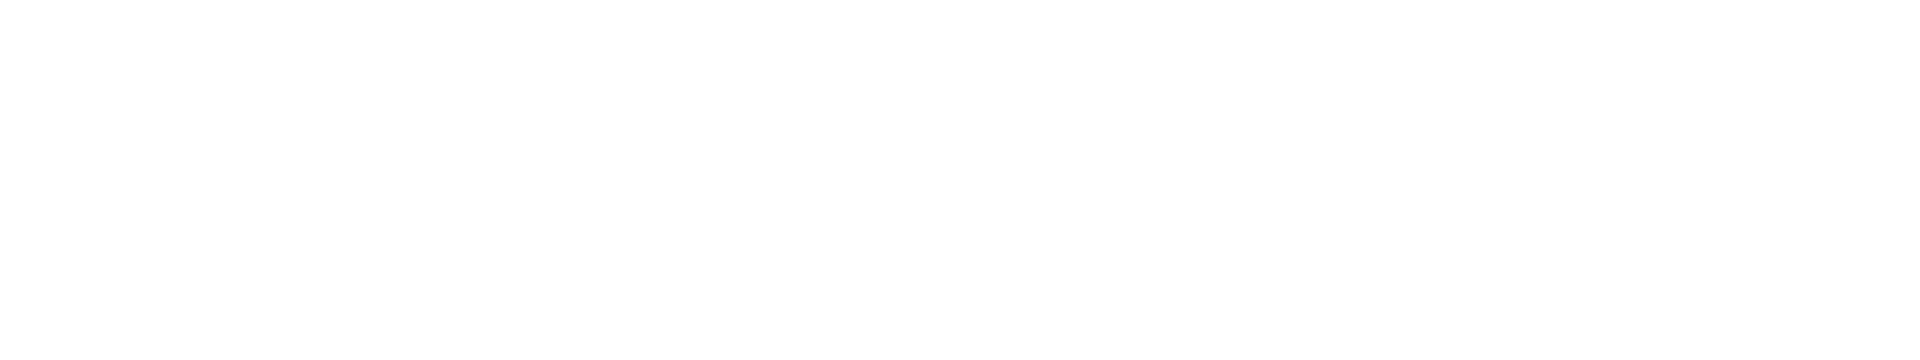 TopRankings logo